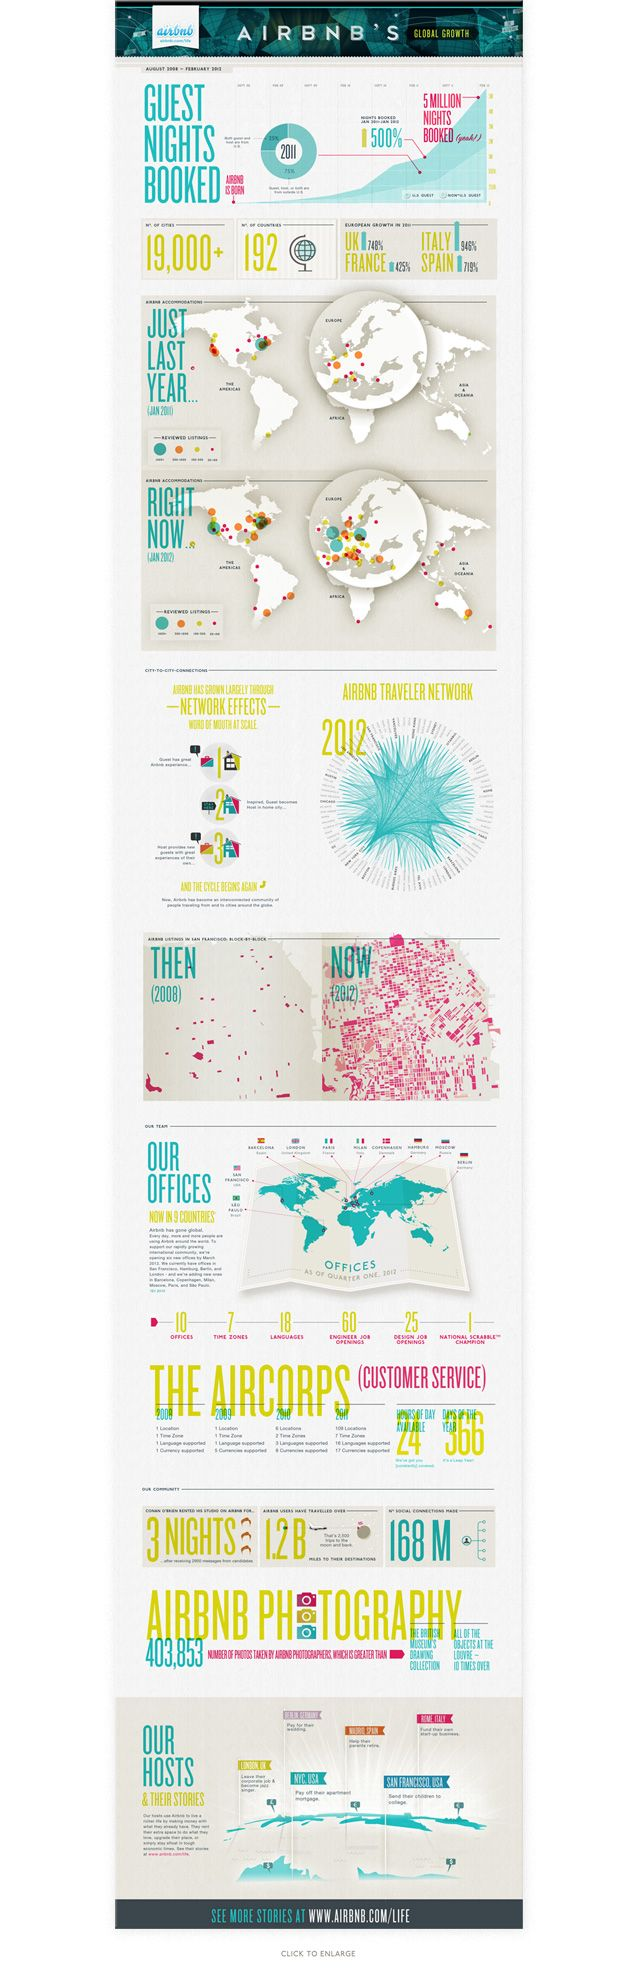 AirBnb 2012 Infographic - kellianderson.com